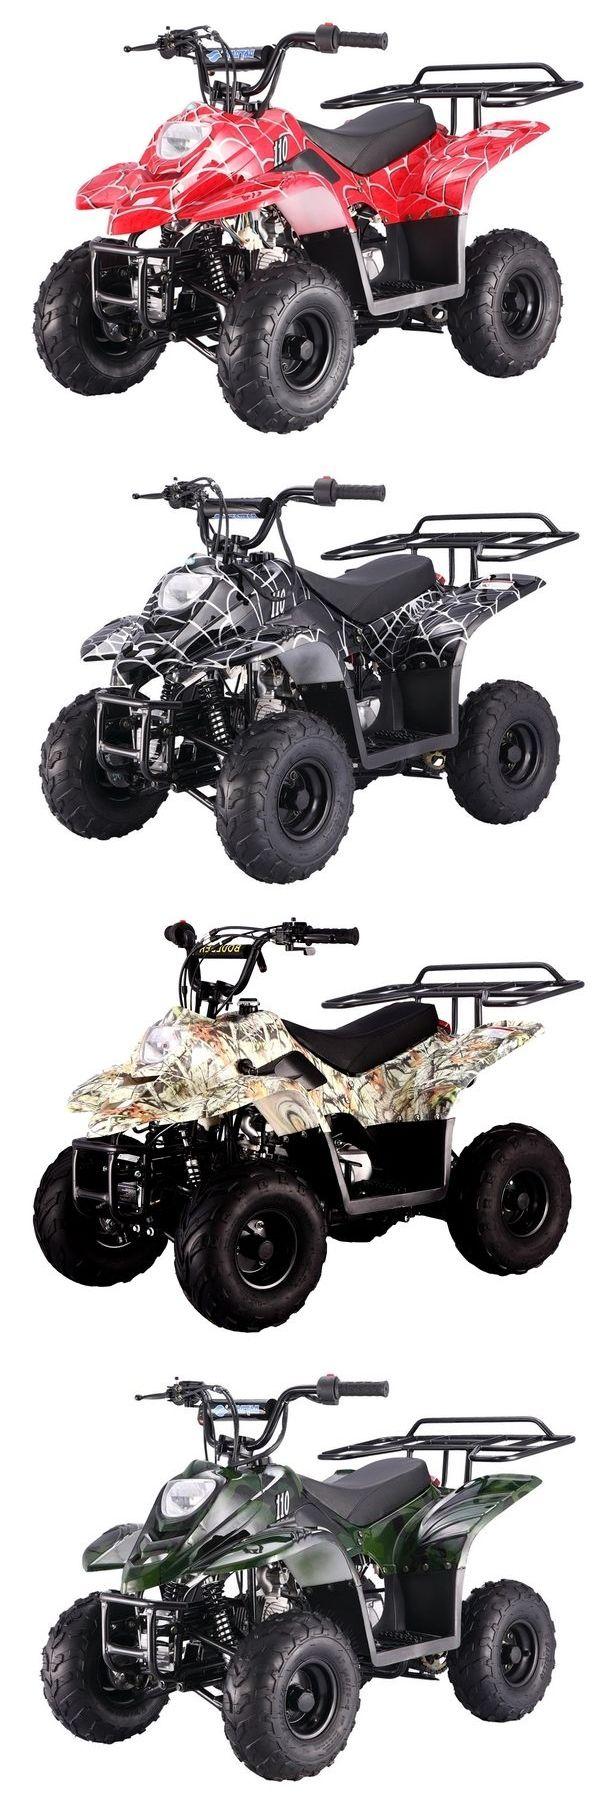 atvs utvs snowmobiles: 110Cc Atv 4 Wheeler For Sale Kids Taotao 110 Cc Atv W Safety Features Free Ship -> BUY IT NOW ONLY: $639 on eBay!